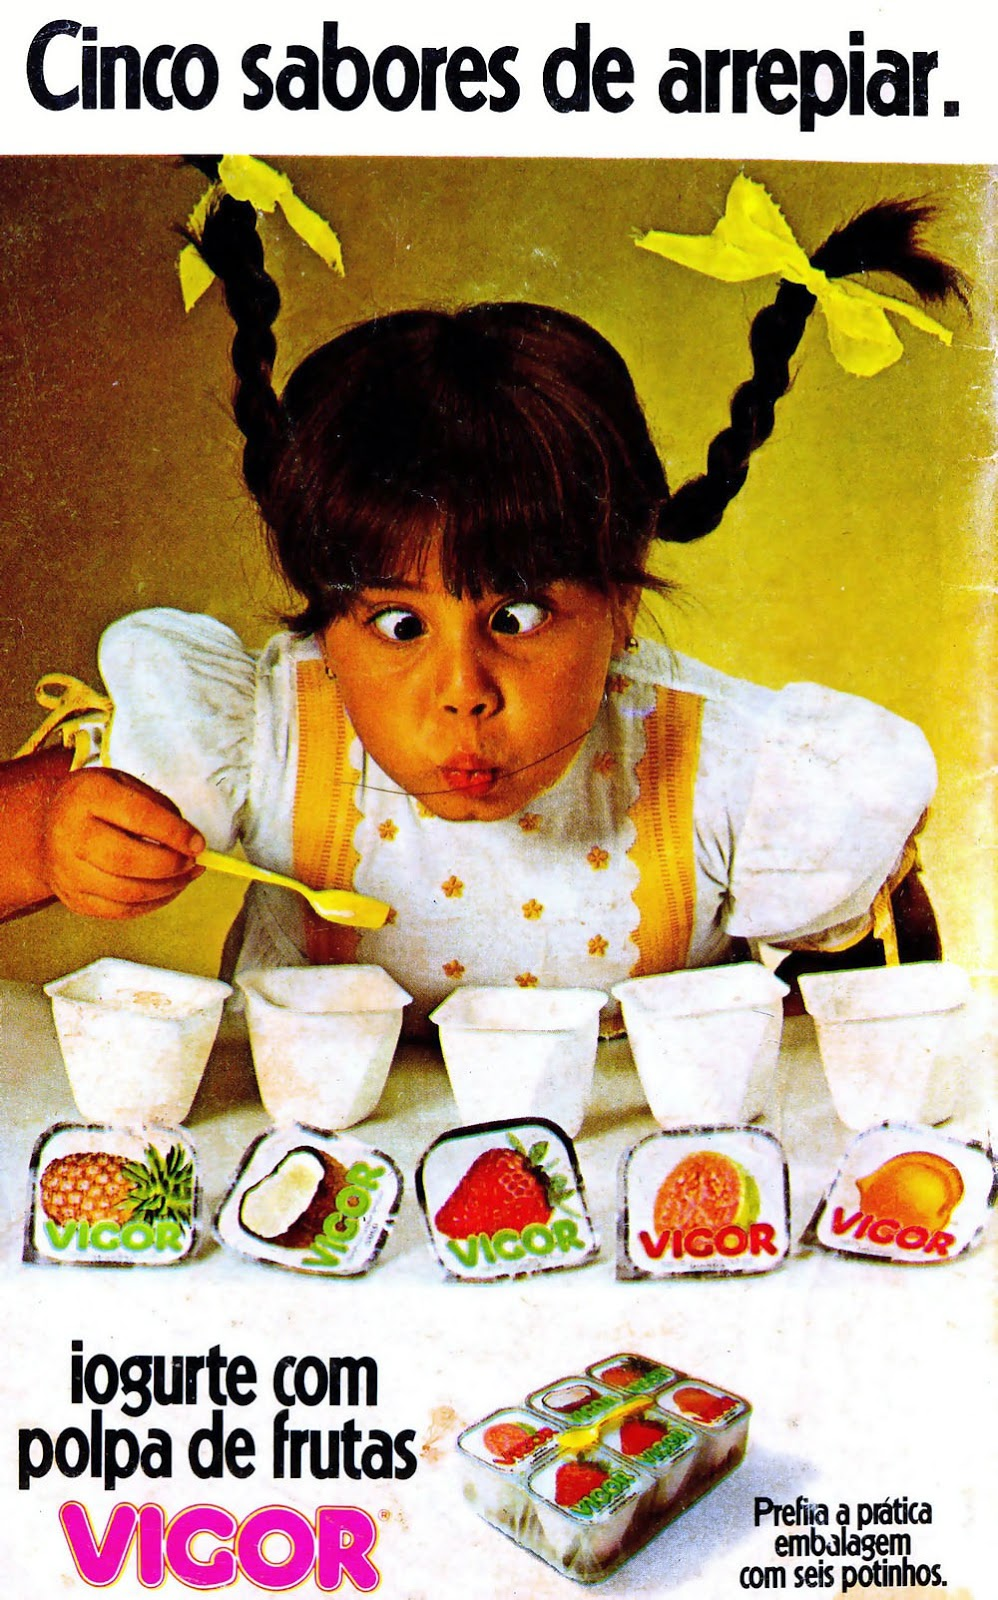 Propaganda do Iogurte Vigor em 1979 apresentando seus cinco deliciosos sabores.